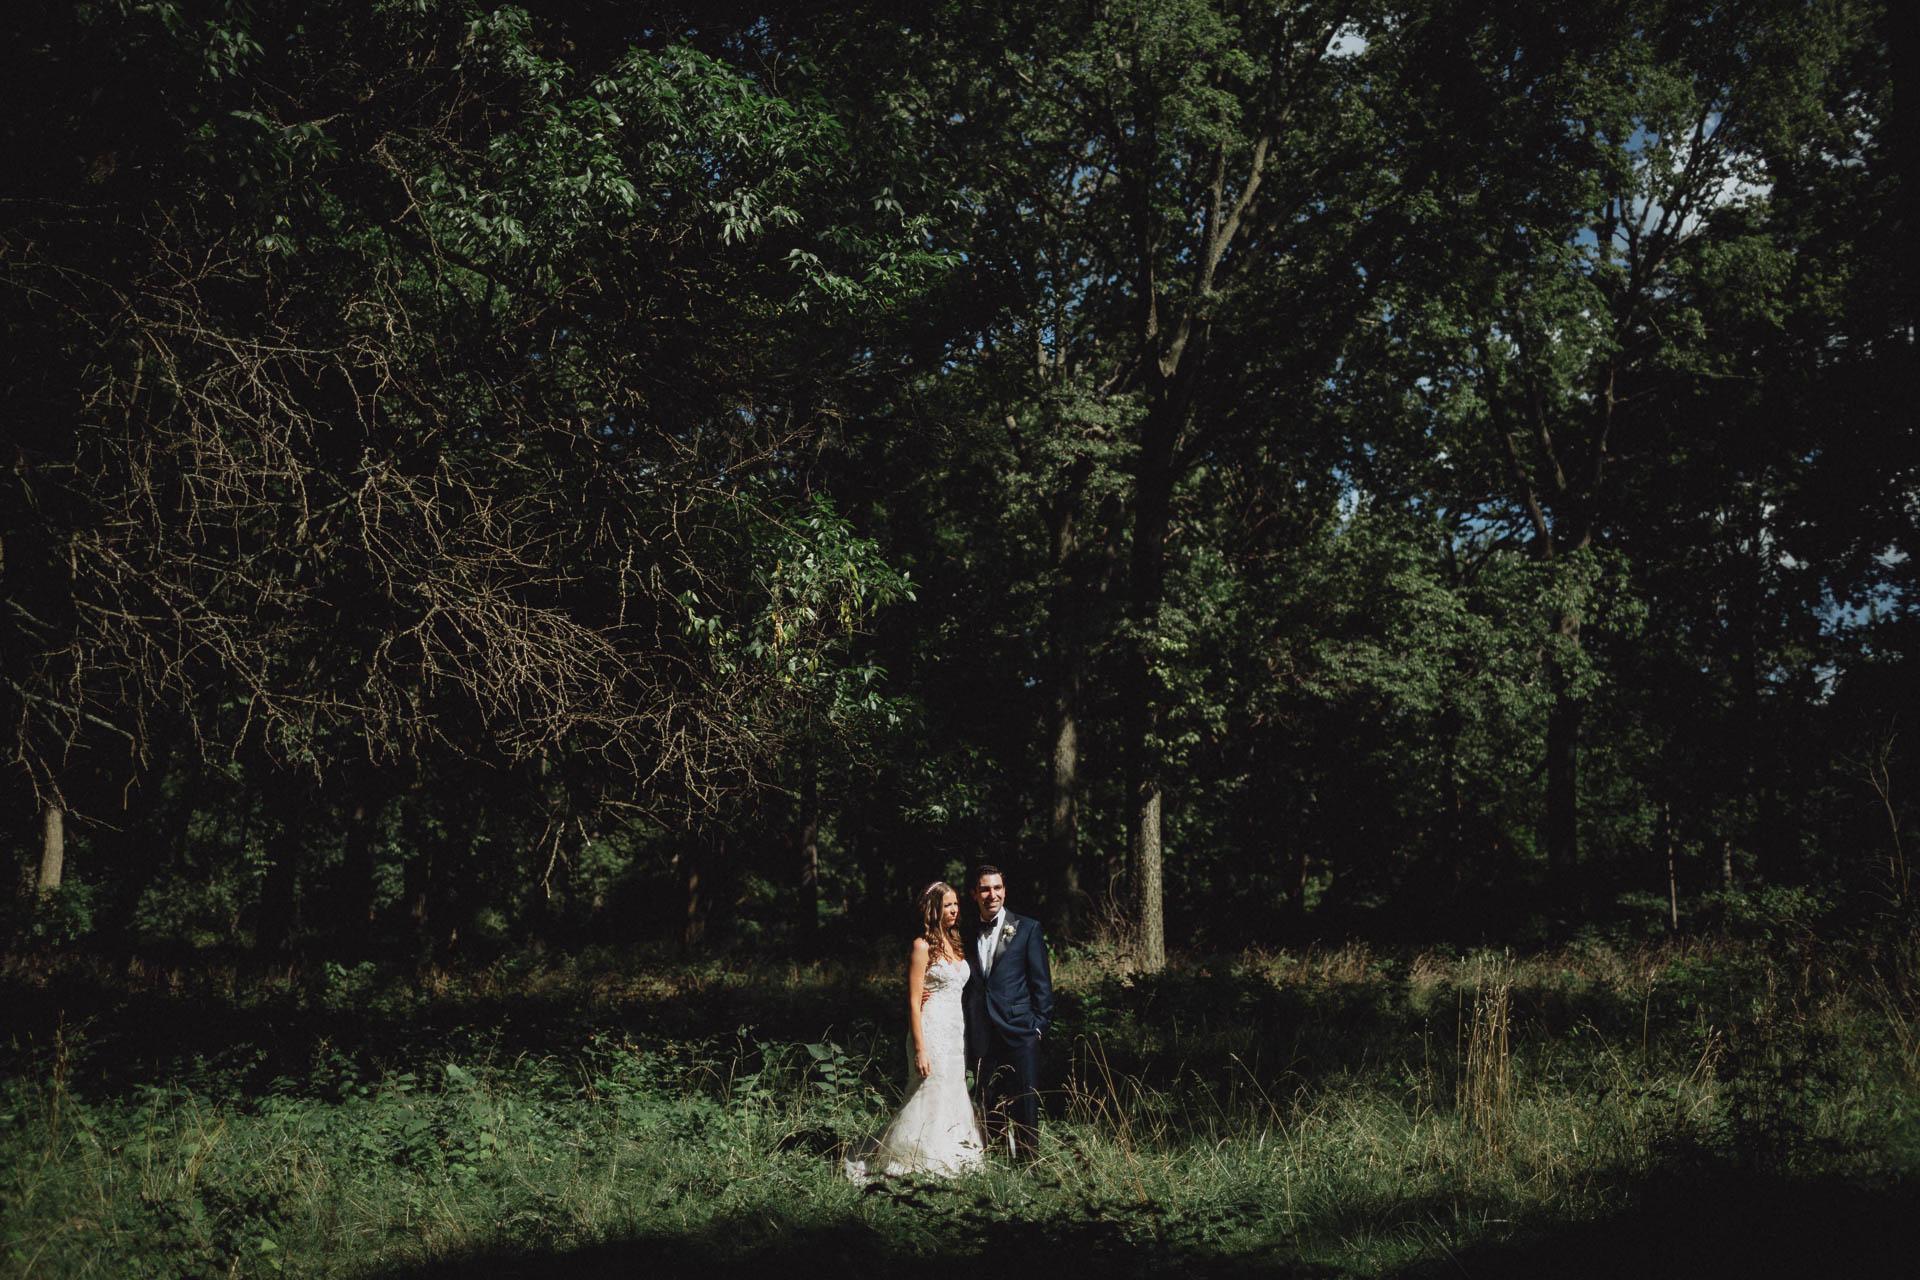 Keri-Joseph-Top-of-the-Market-Wedding-116@2x.jpg